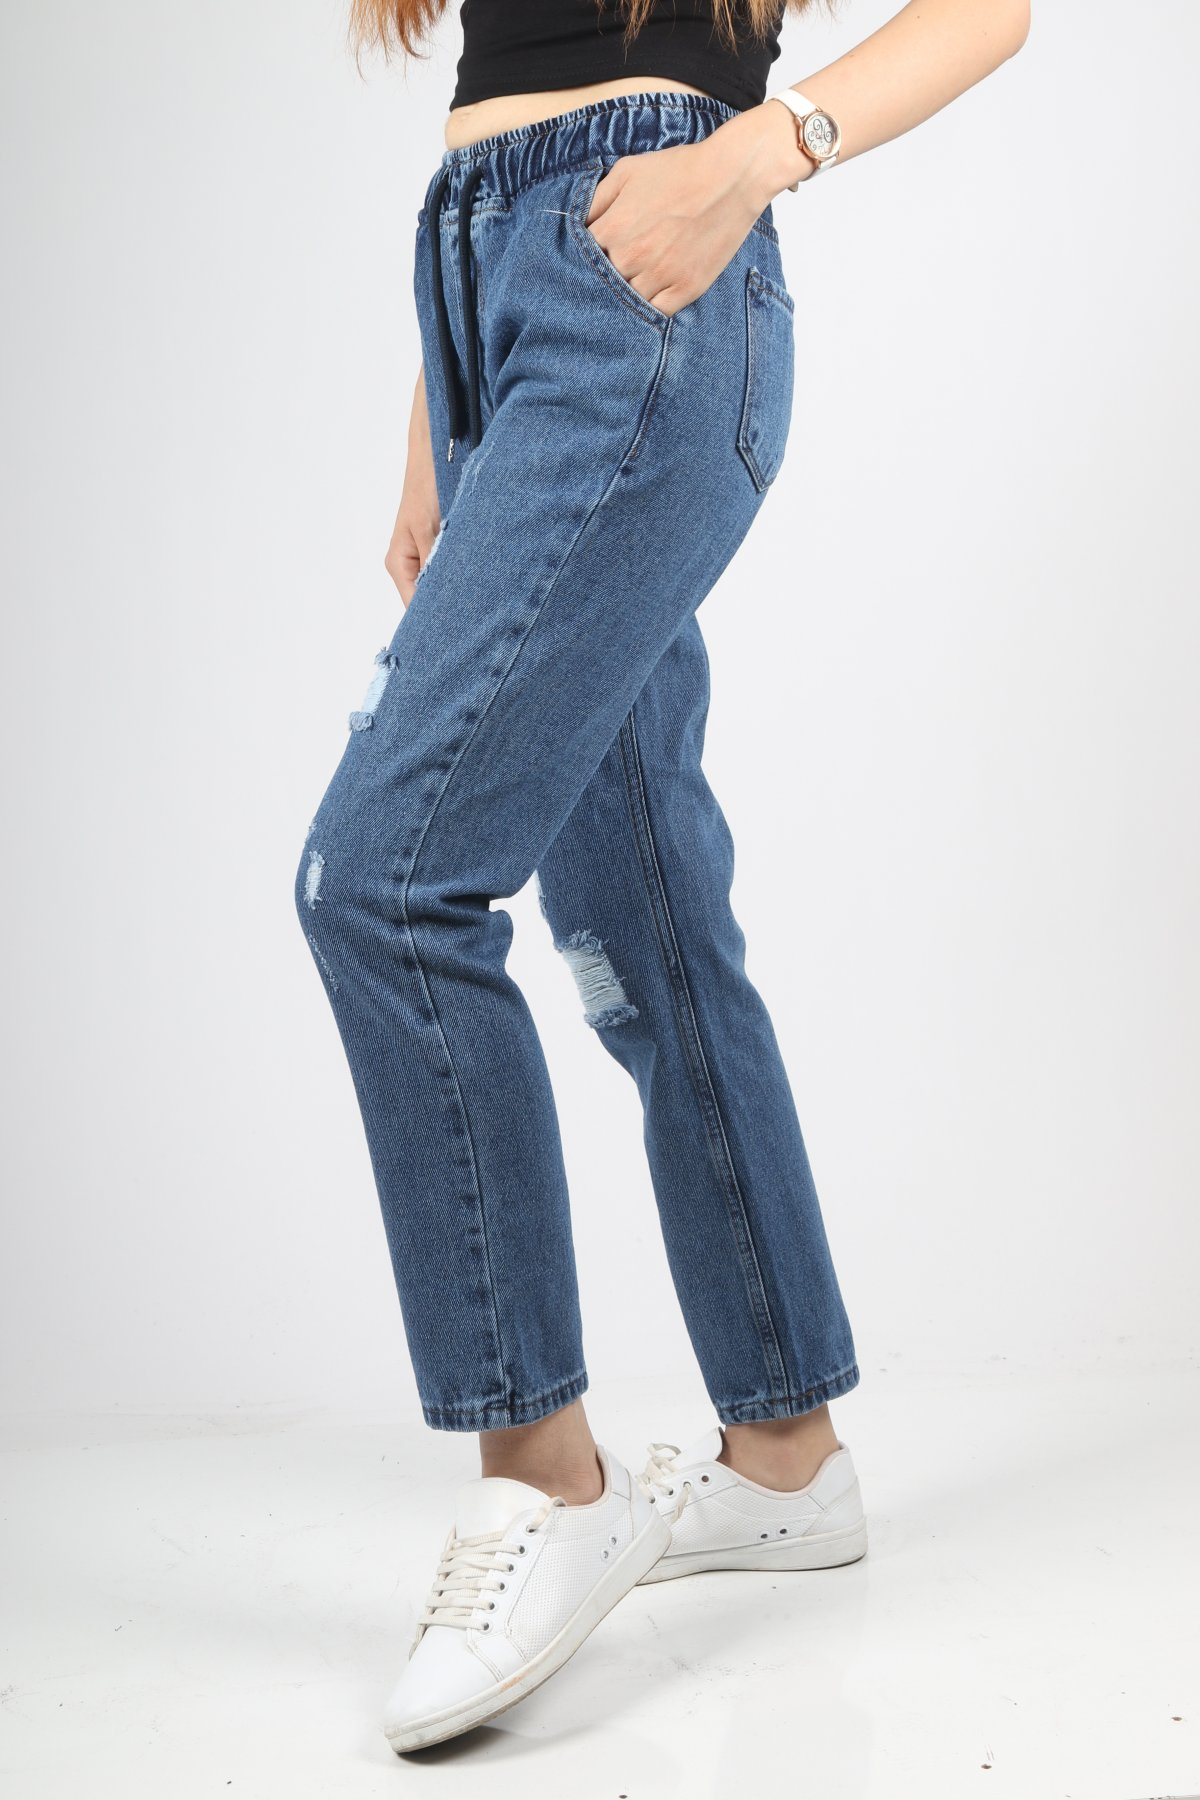 Lazer Kesim Bel Lastik Bağcık Pantolon